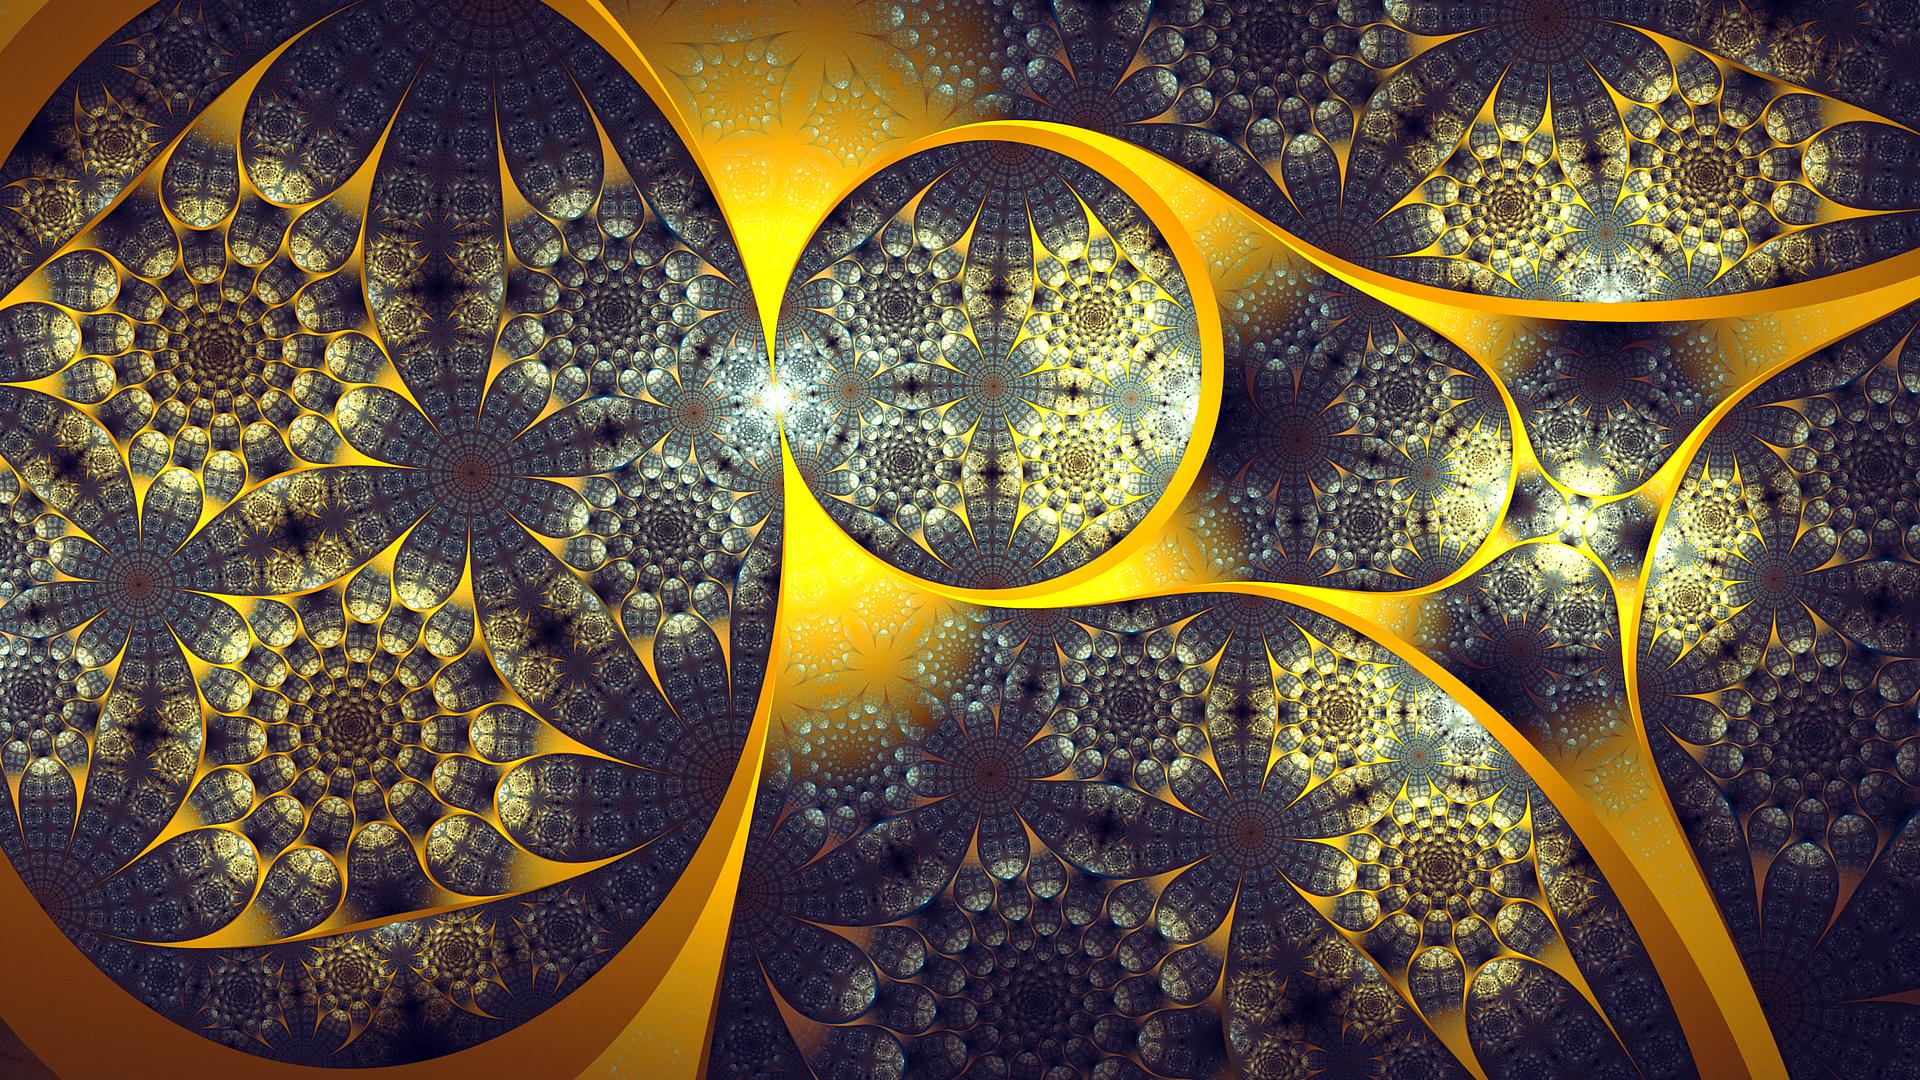 Abstract - Fractal  Artistic Digital Art Wallpaper